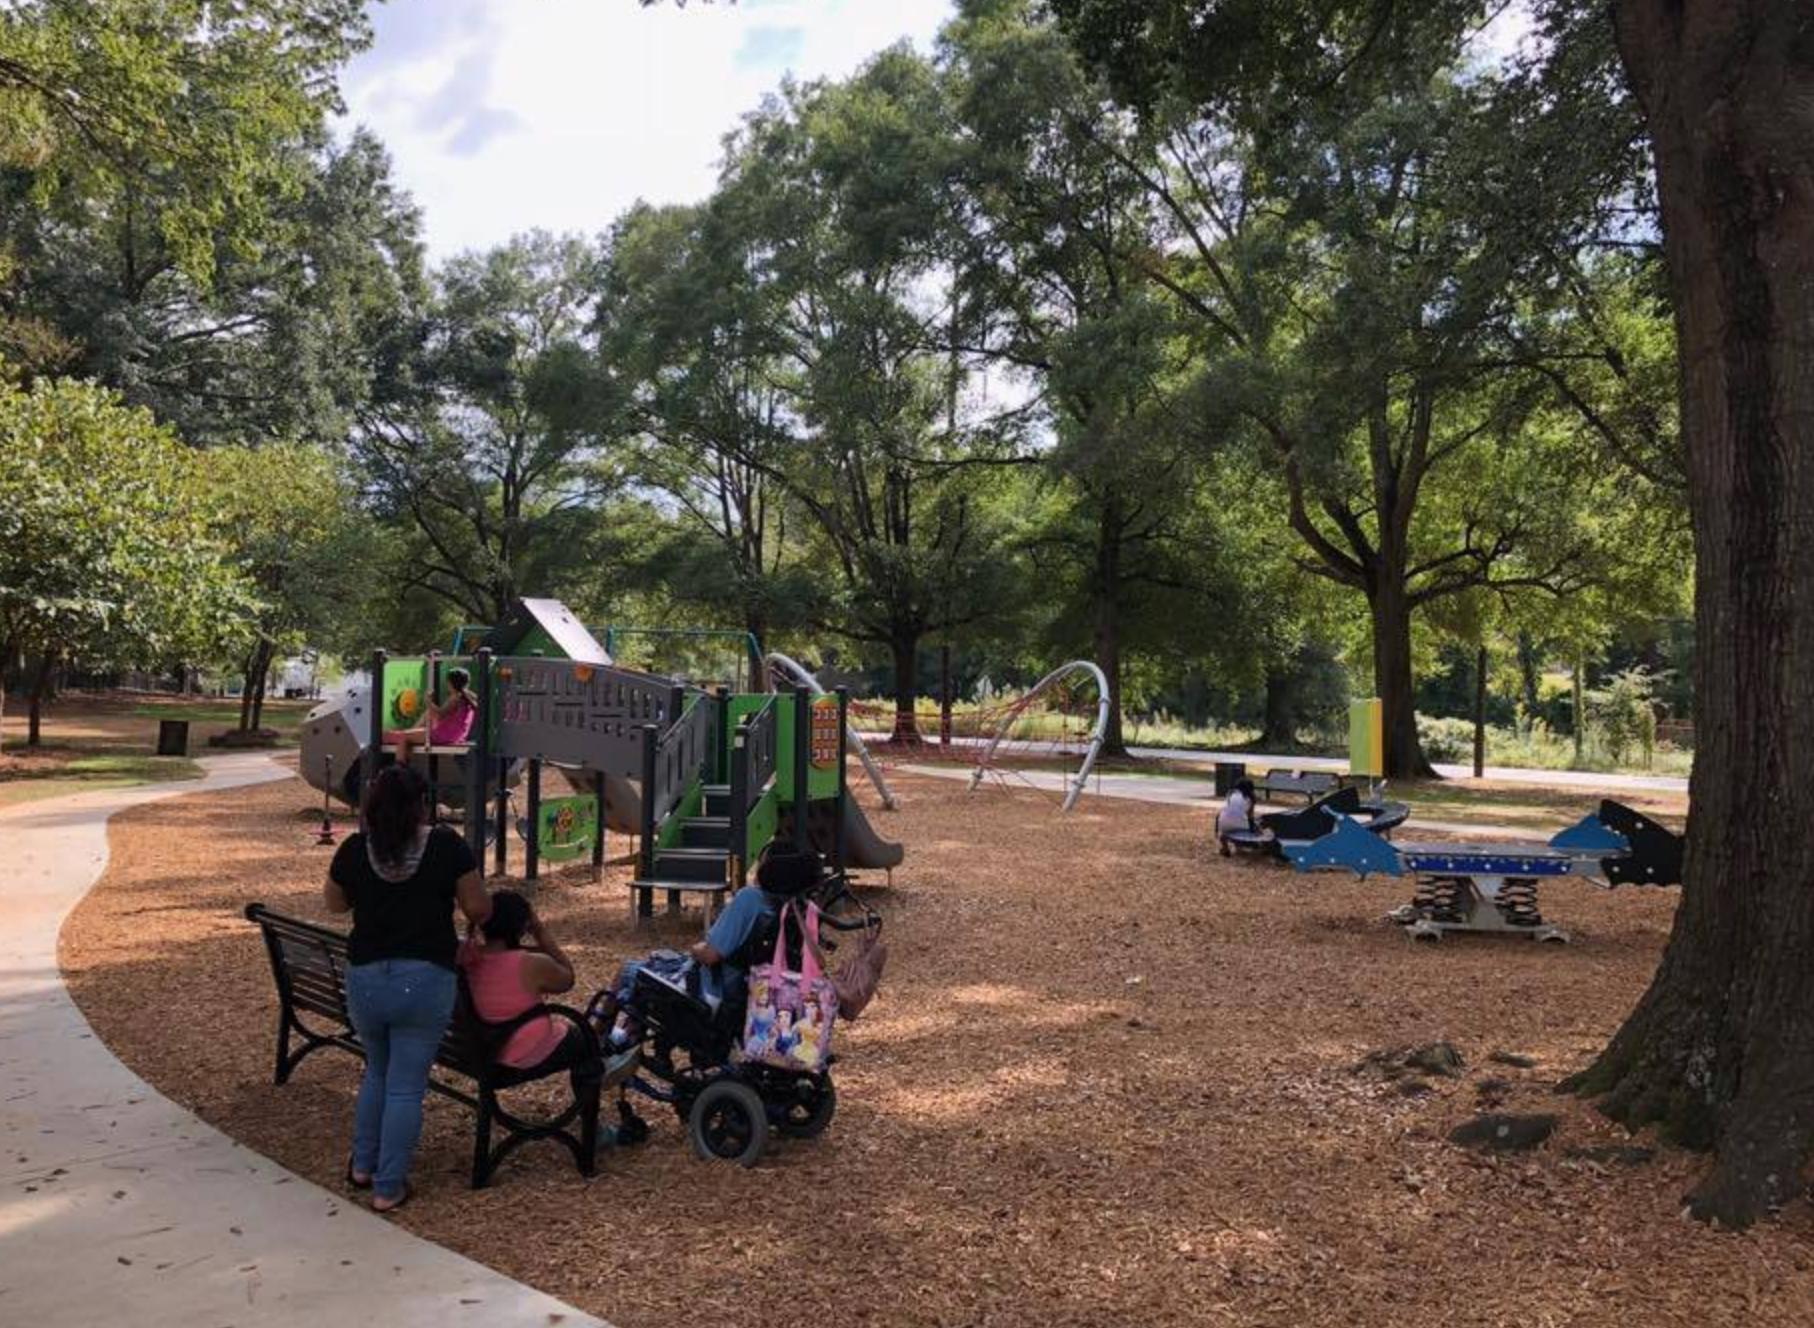 A special needs family enjoying the park.